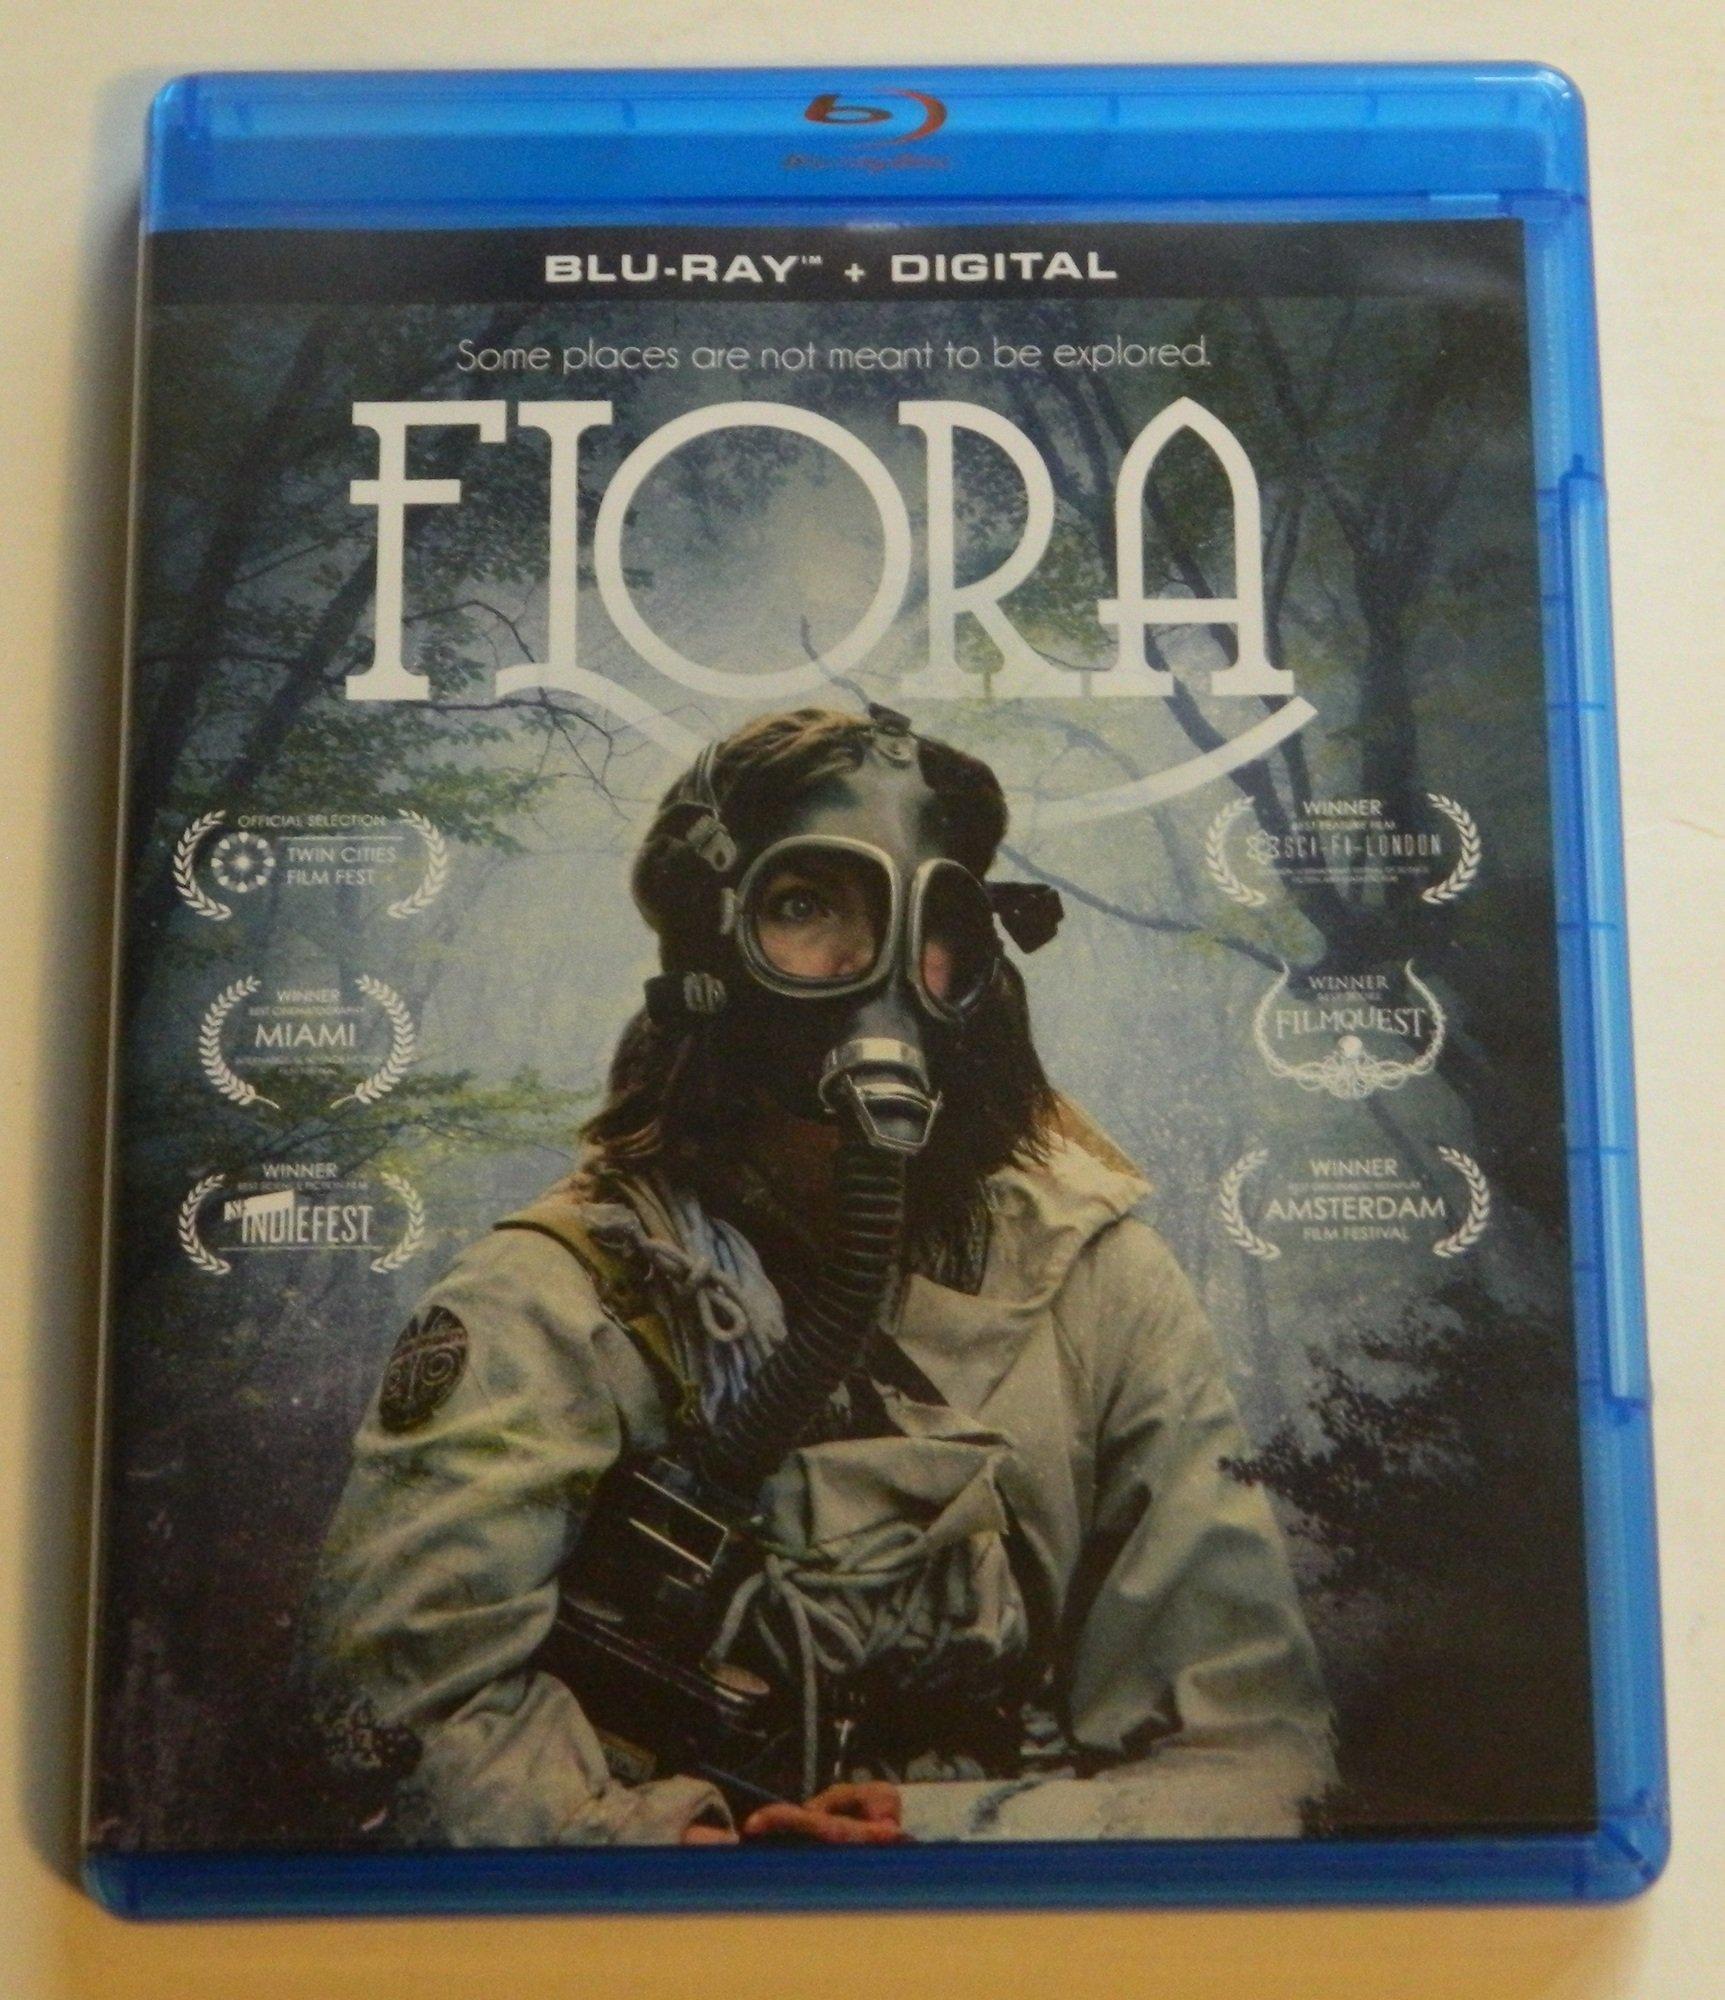 Flora Blu-Ray